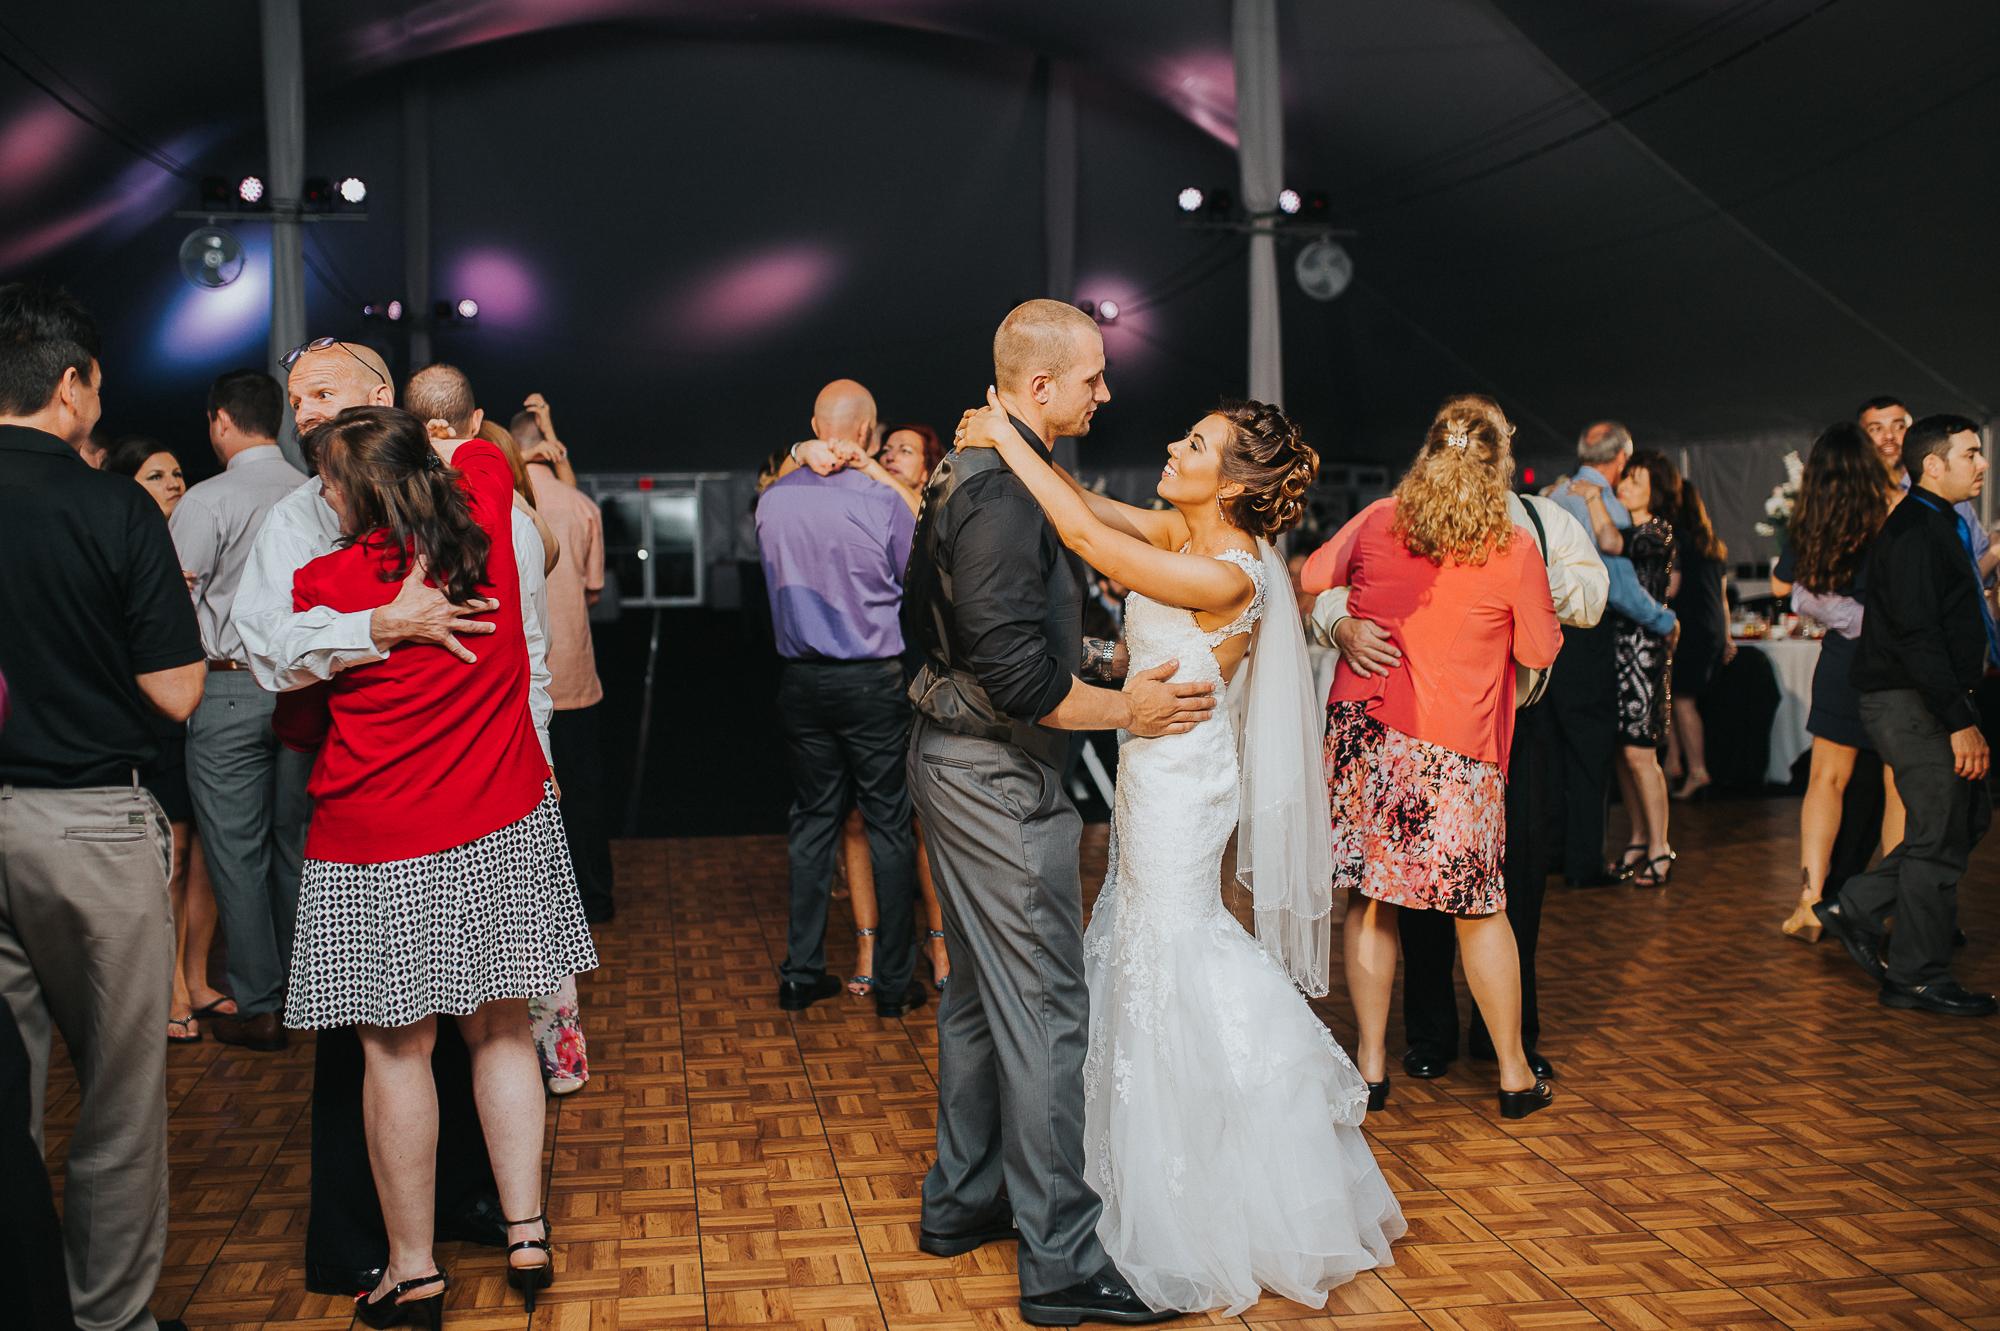 Christina-and-Gene-Wedding-Marla-Rain-Photography-613.jpg